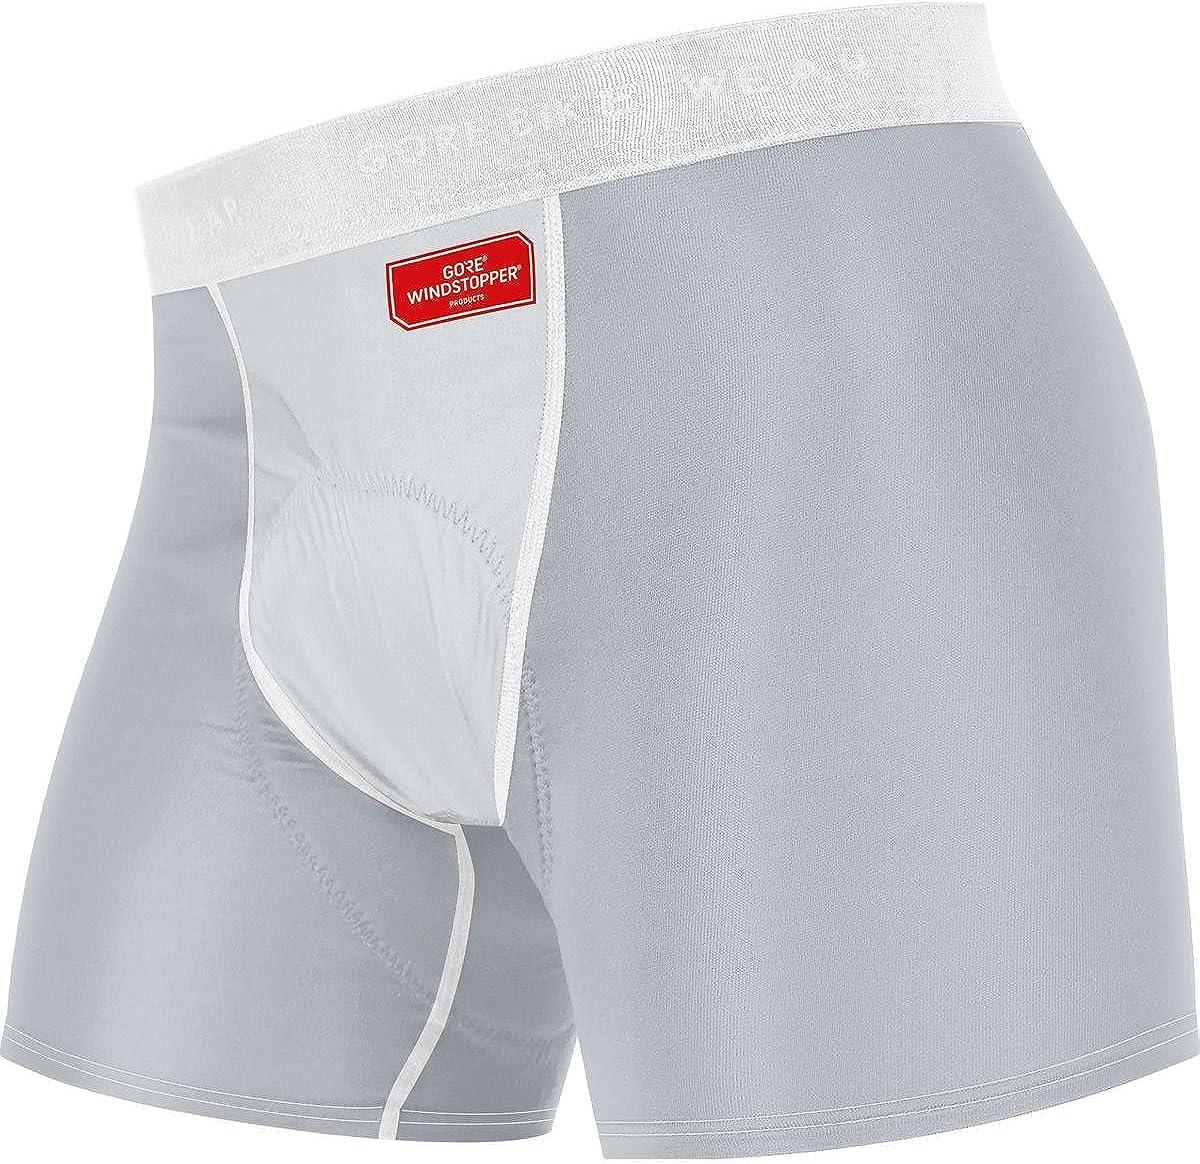 GORE WEAR C3 Damen Fahrrad-Boxer-Shorts mit Sitzpolster GORE WINDSTOPPER